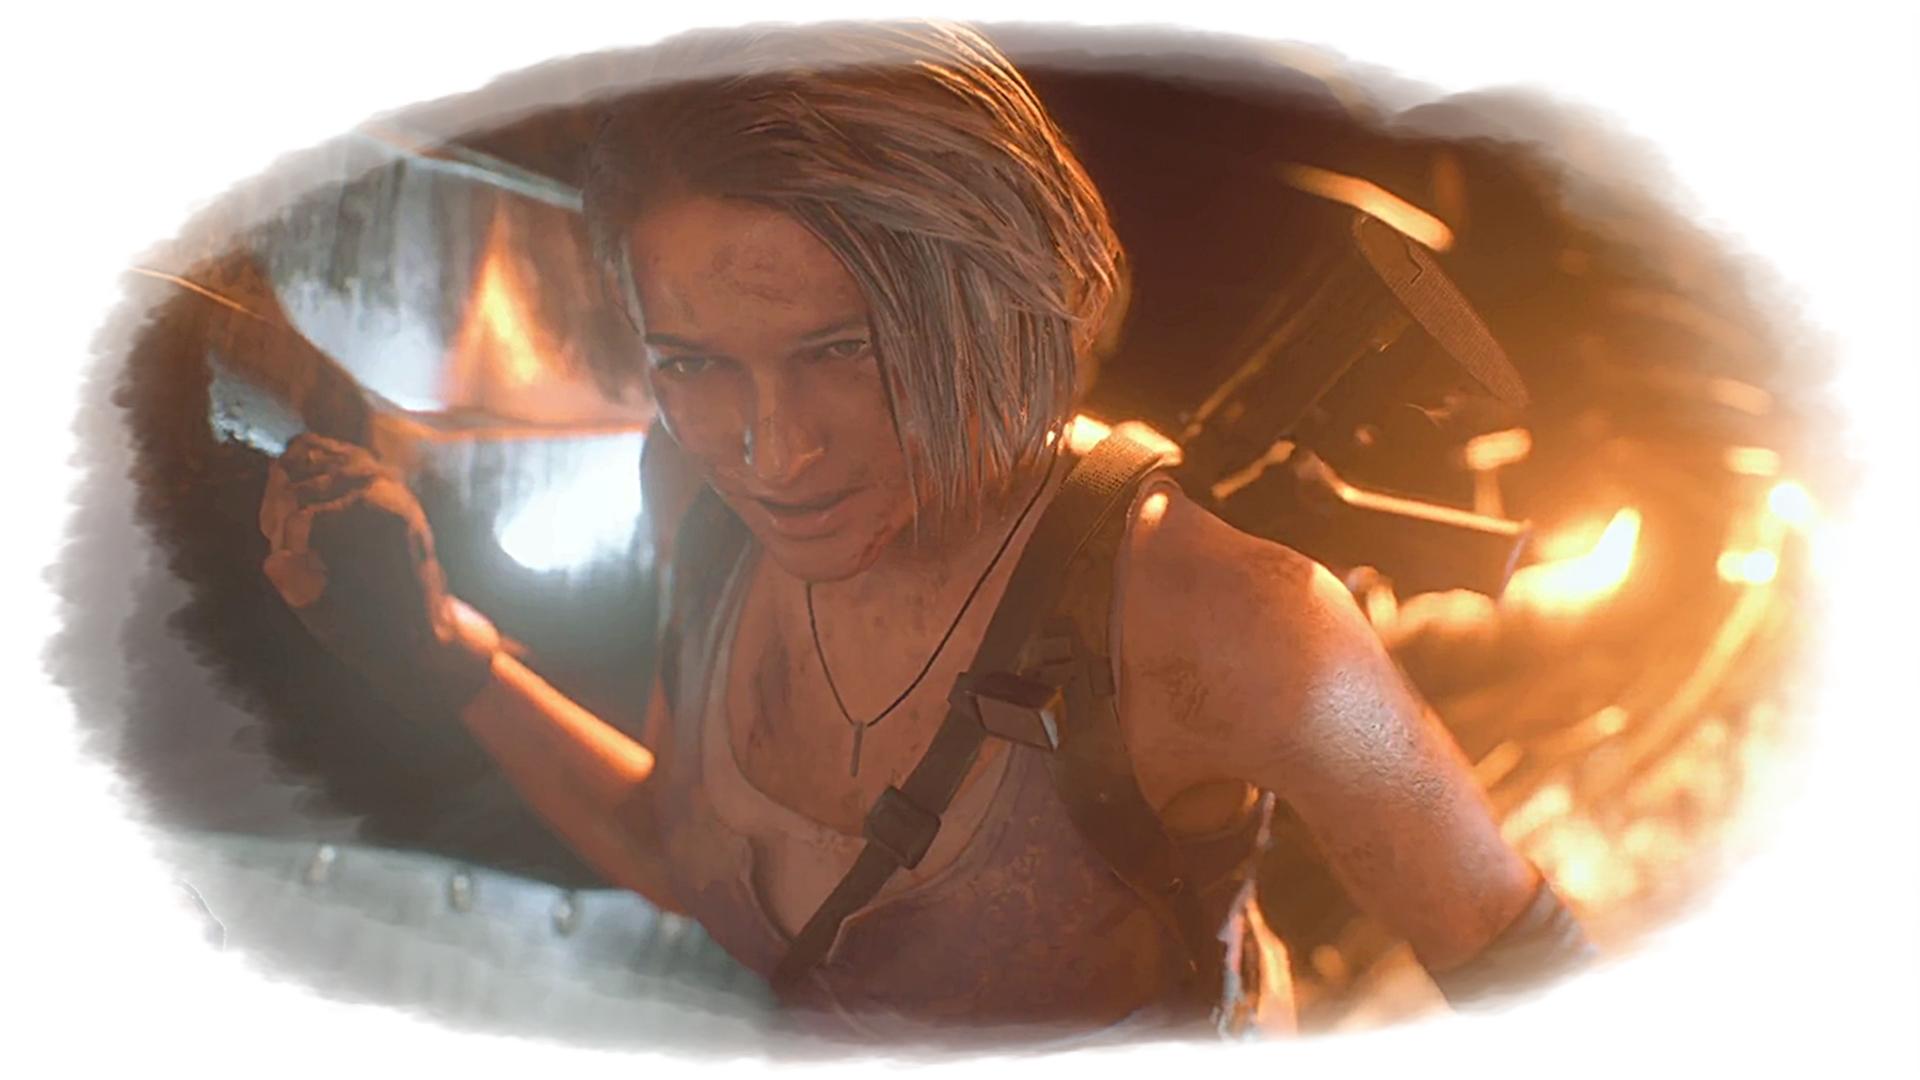 Resident Evil 3 Remake Джилл Валентайн арт - Resident Evil 3: Nemesis